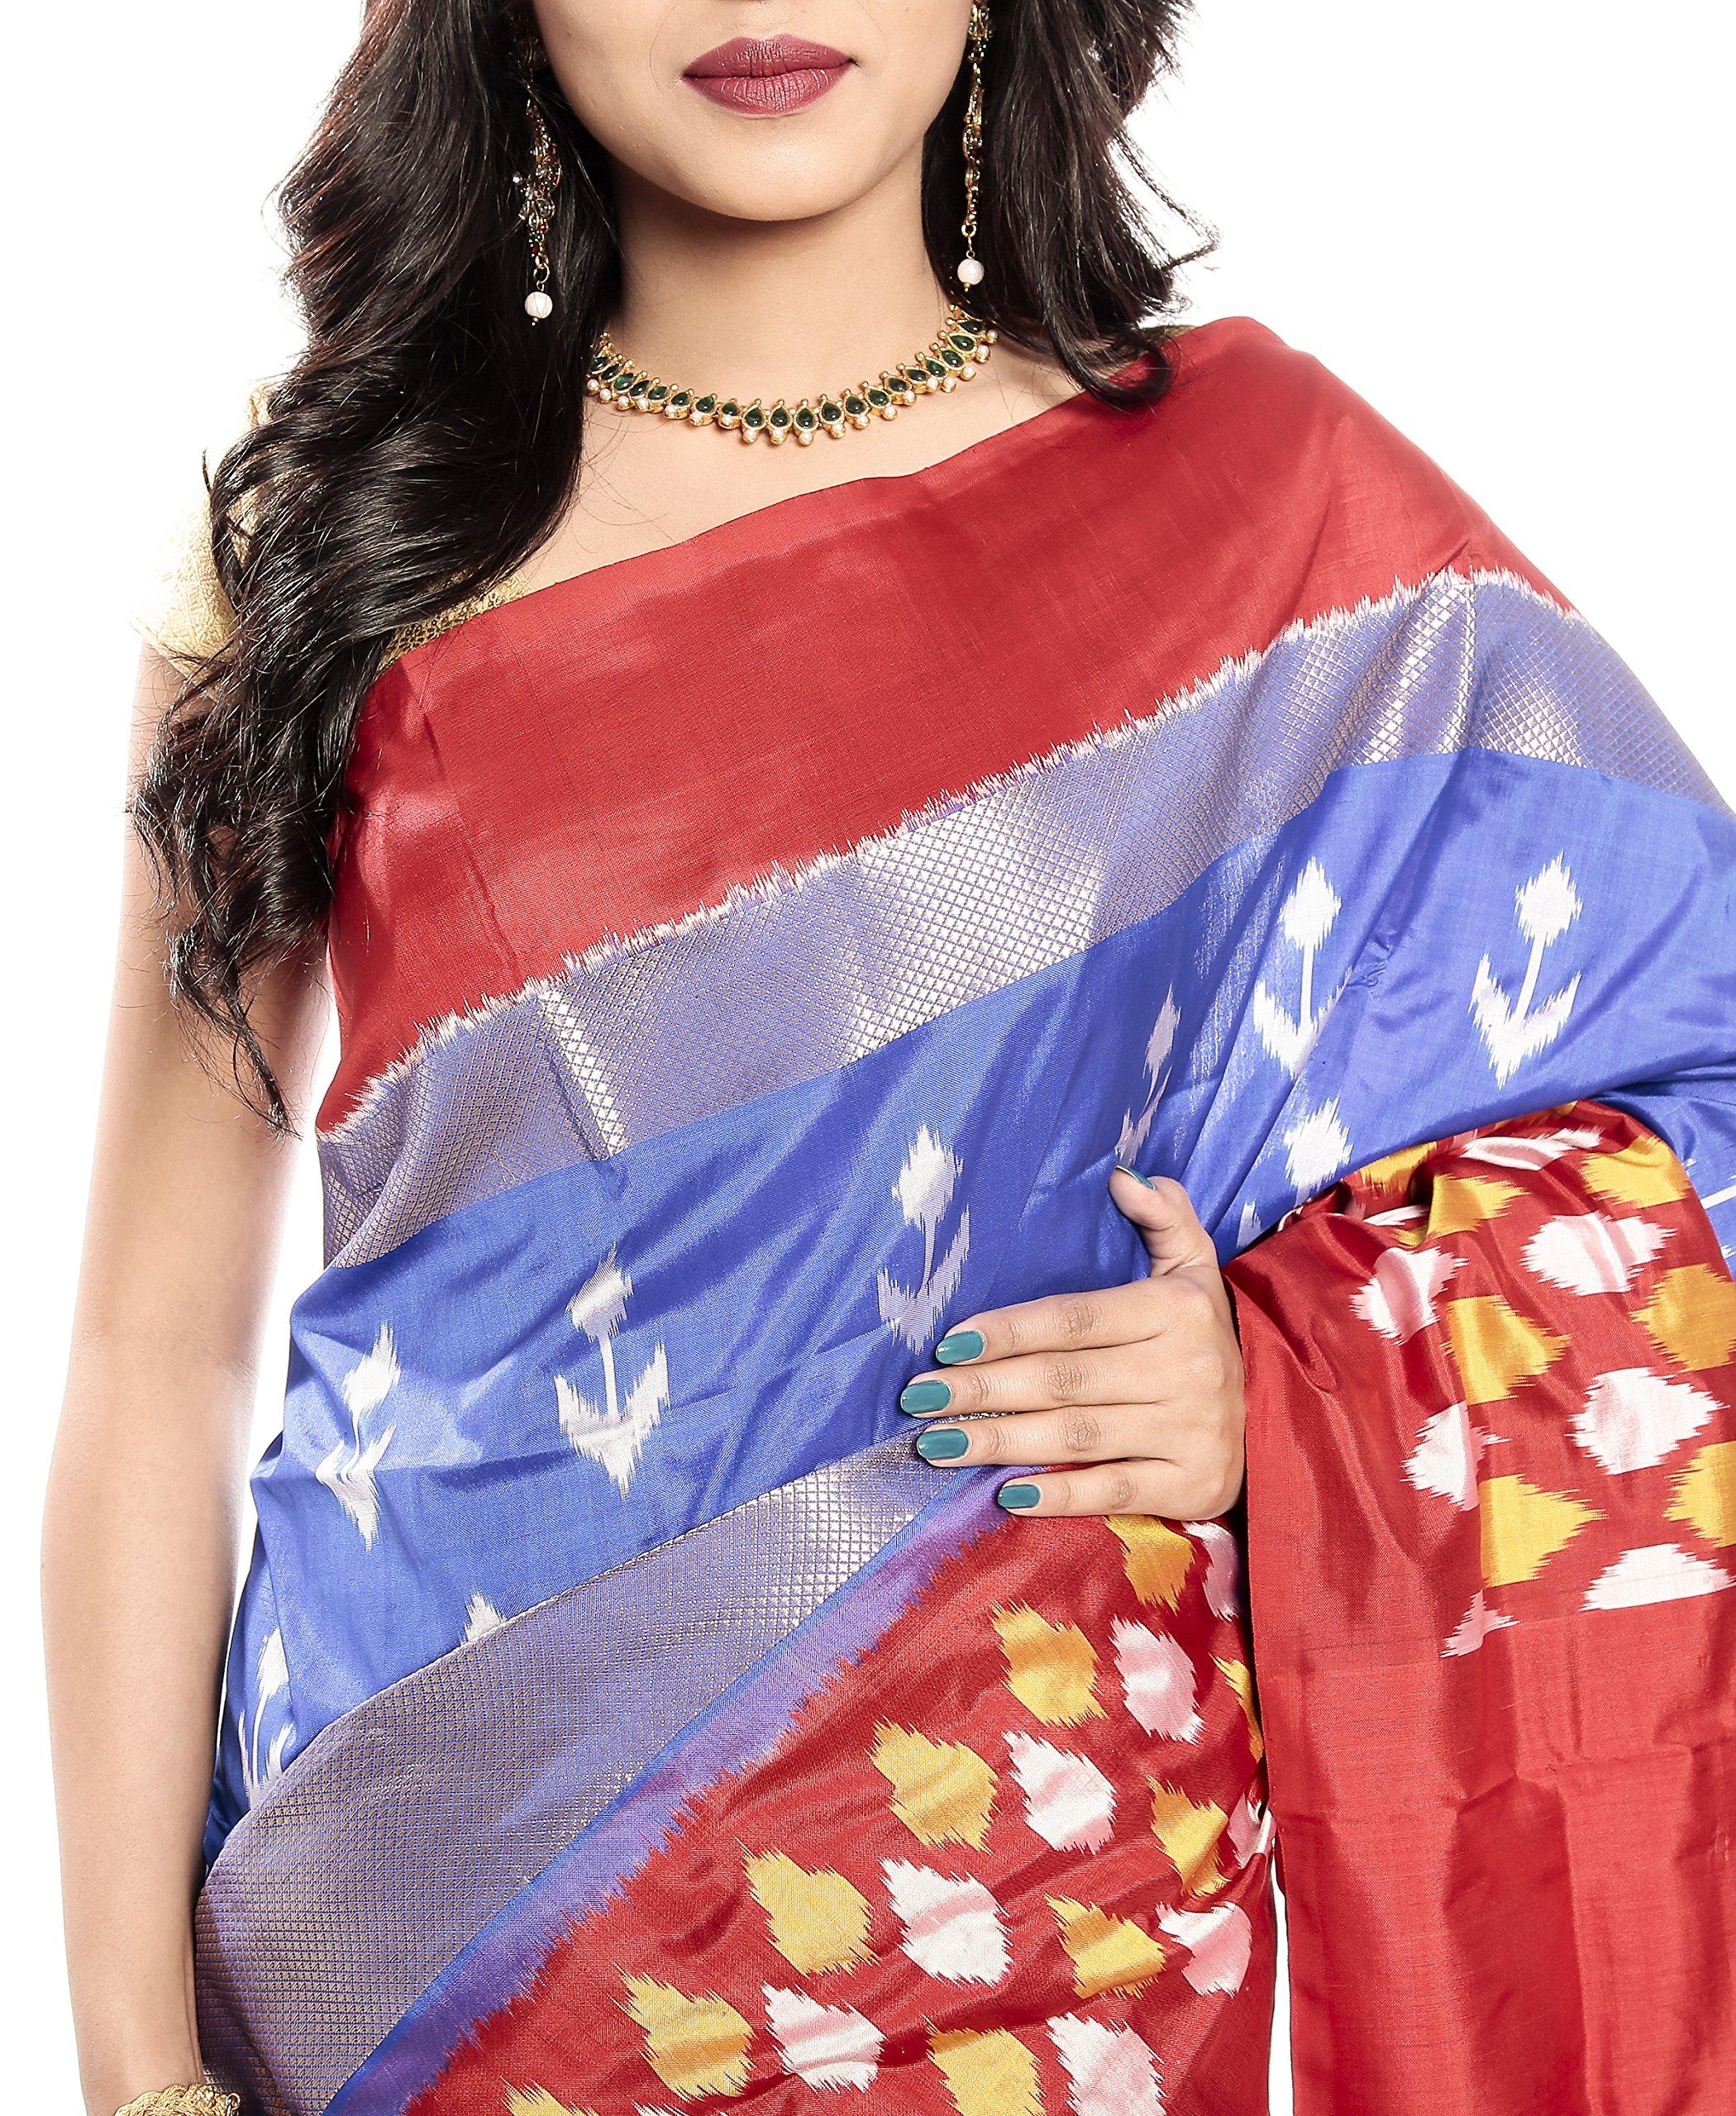 Mandakini — Indian Women's Pochampally - Handloom - Ikat Pure Silk Saree (Blue-Reddish Orange ) (MK355) by Mandakini (Image #3)